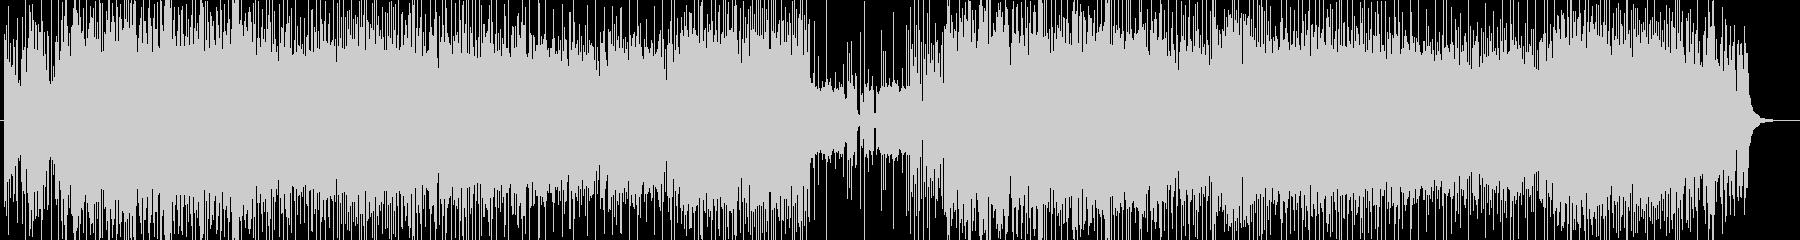 「HR/HM」「DEATH」BGM175の未再生の波形